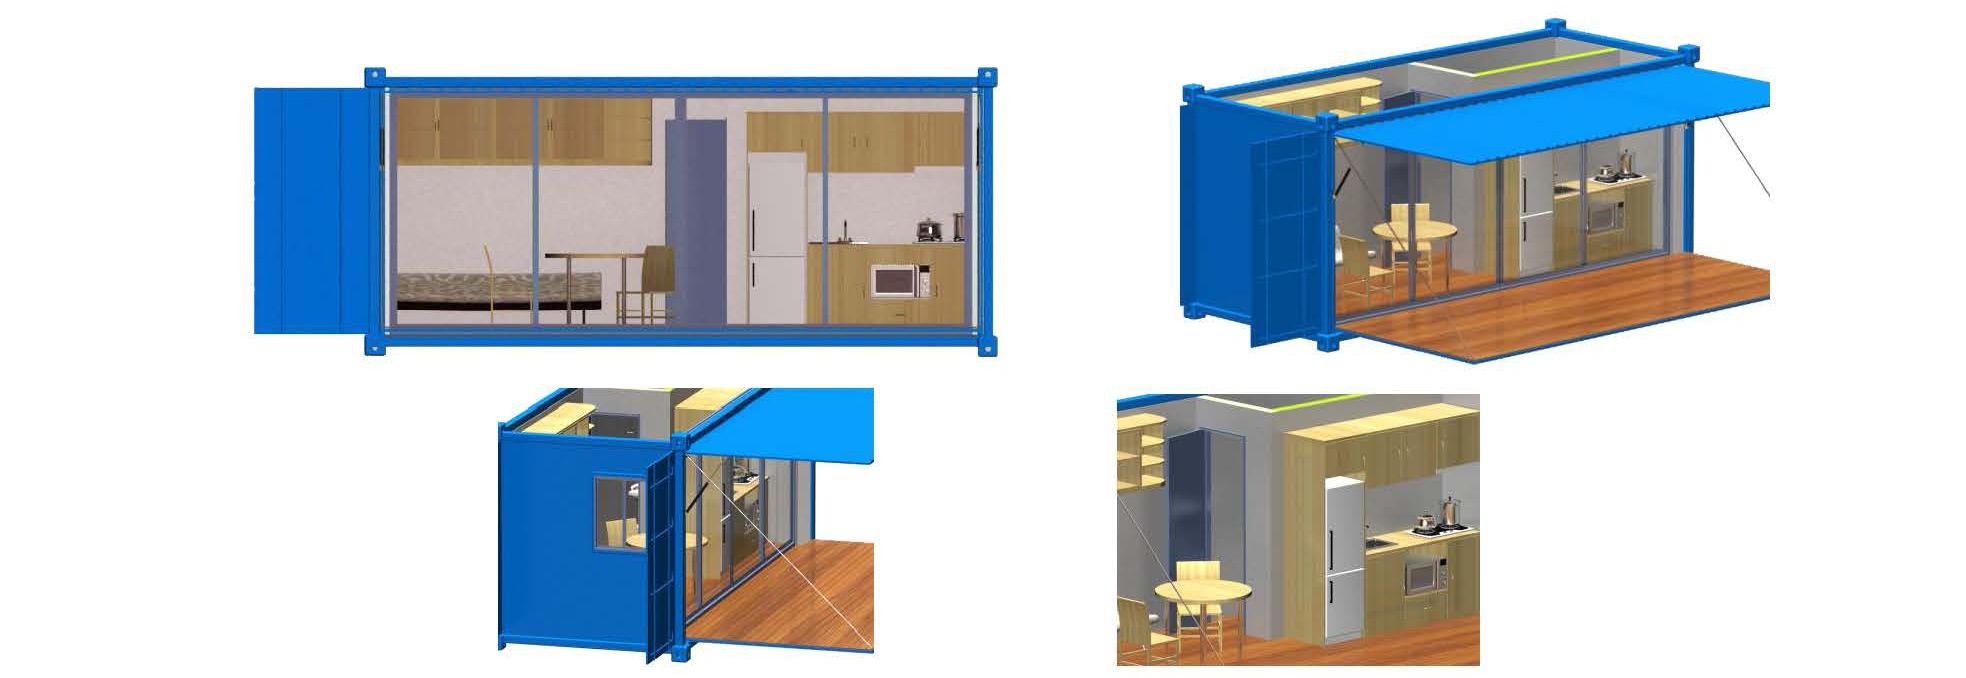 c15_20ft_kitchen_bathroom_sofa-bed_open-plan-unit_full-deck02